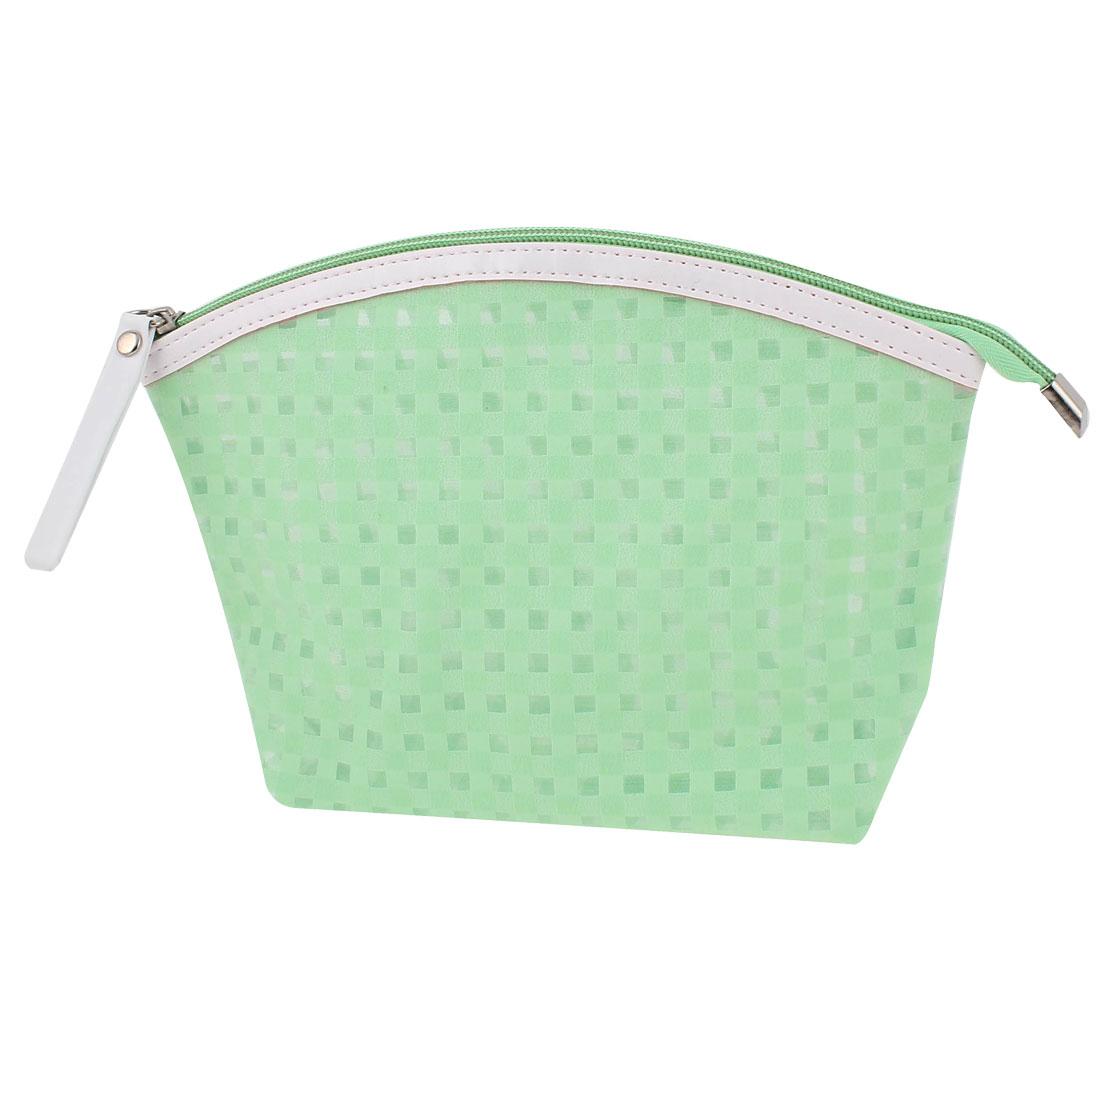 Women Travel Portable Zippered Plaids Pattern PVC Cosmetic Bag Makeup Handbag Toiletries Sundries Holder Green